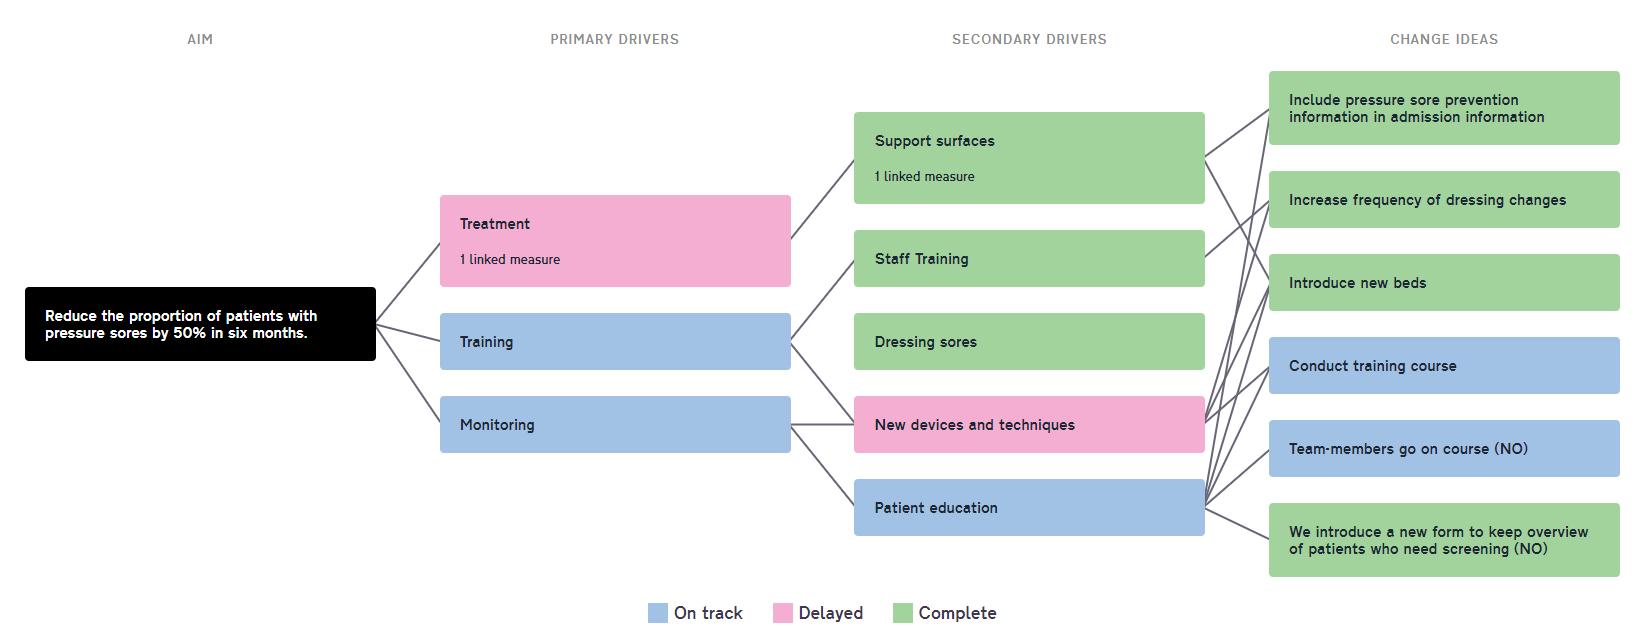 Understanding Driver Diagrams for Driver Diagram